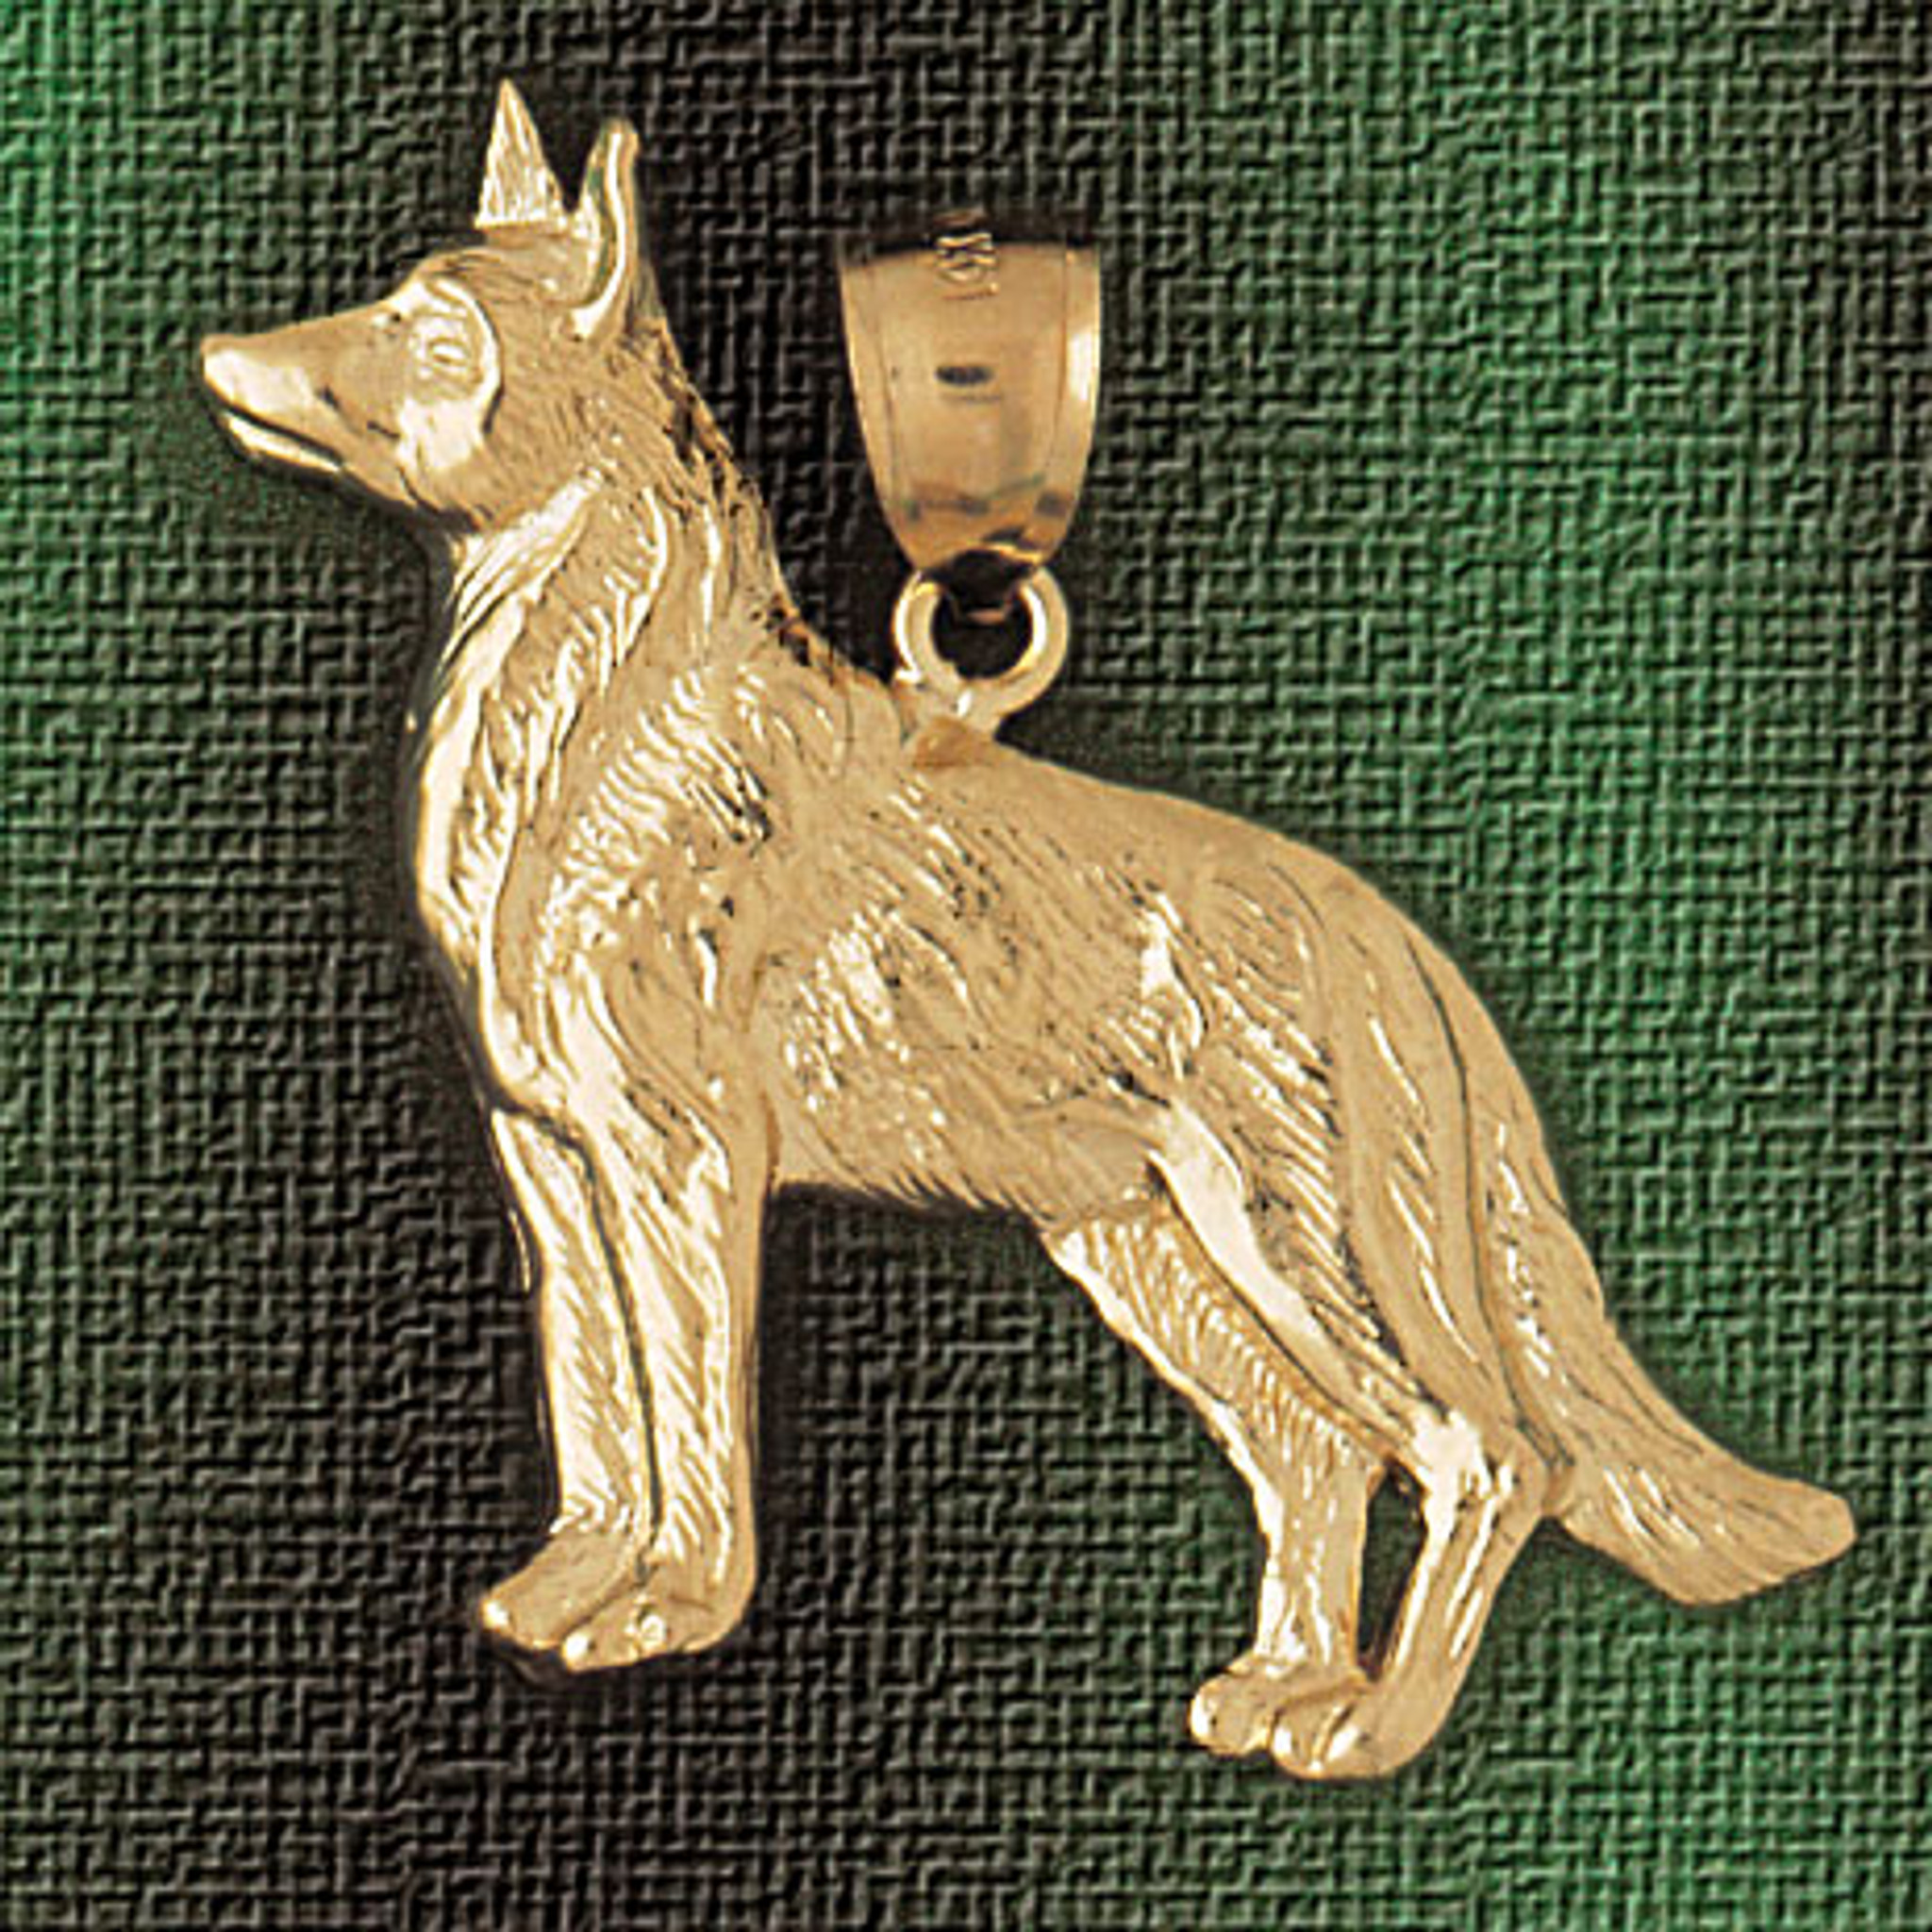 12cb0a078e53d German Shepherd Dog Pendant Necklace Charm Bracelet in Gold or Silver 2142